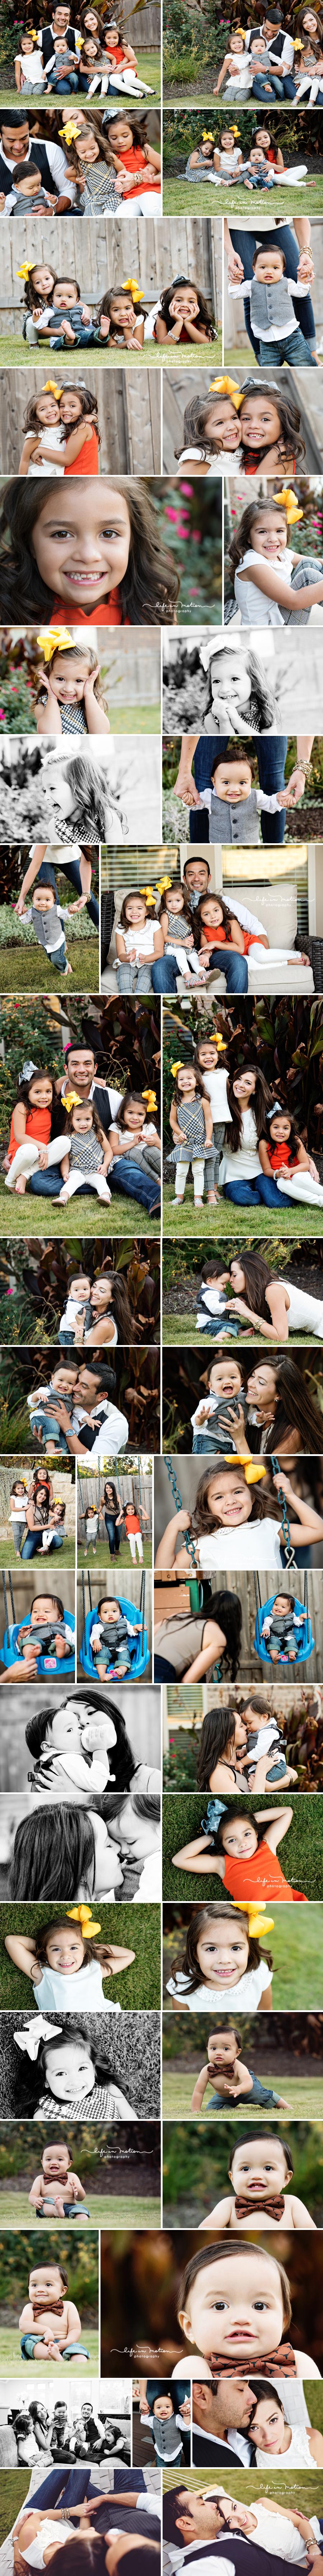 round_rock_texas_family_photographer